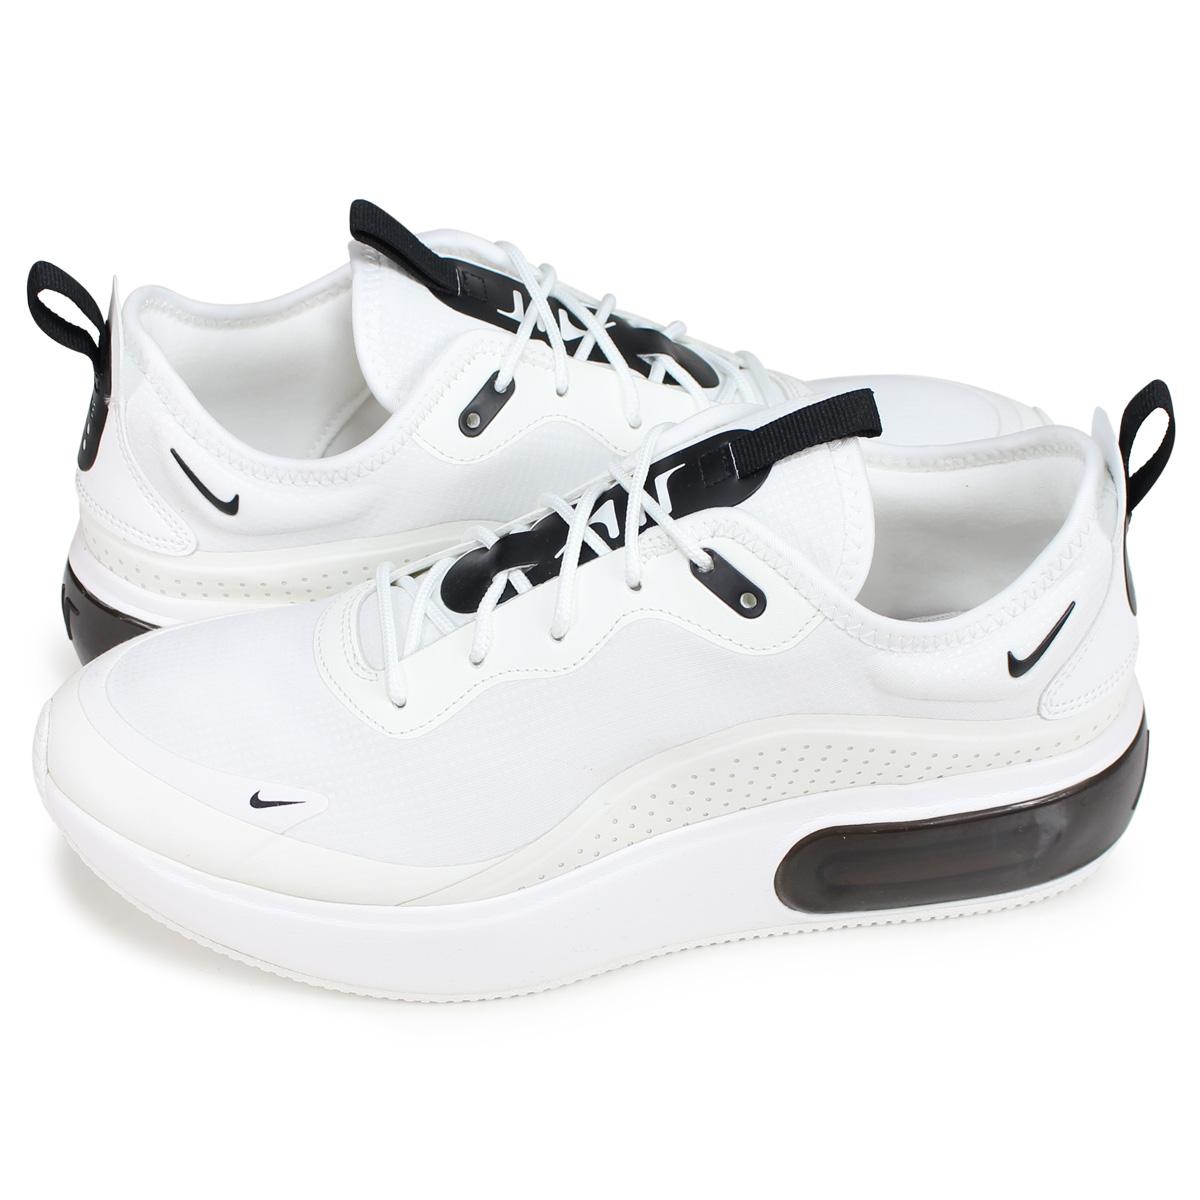 0e1eb64c1 Nike NIKE Air Max sneakers Lady's men WMNS AIR MAX DIA white AQ4312-100 ...